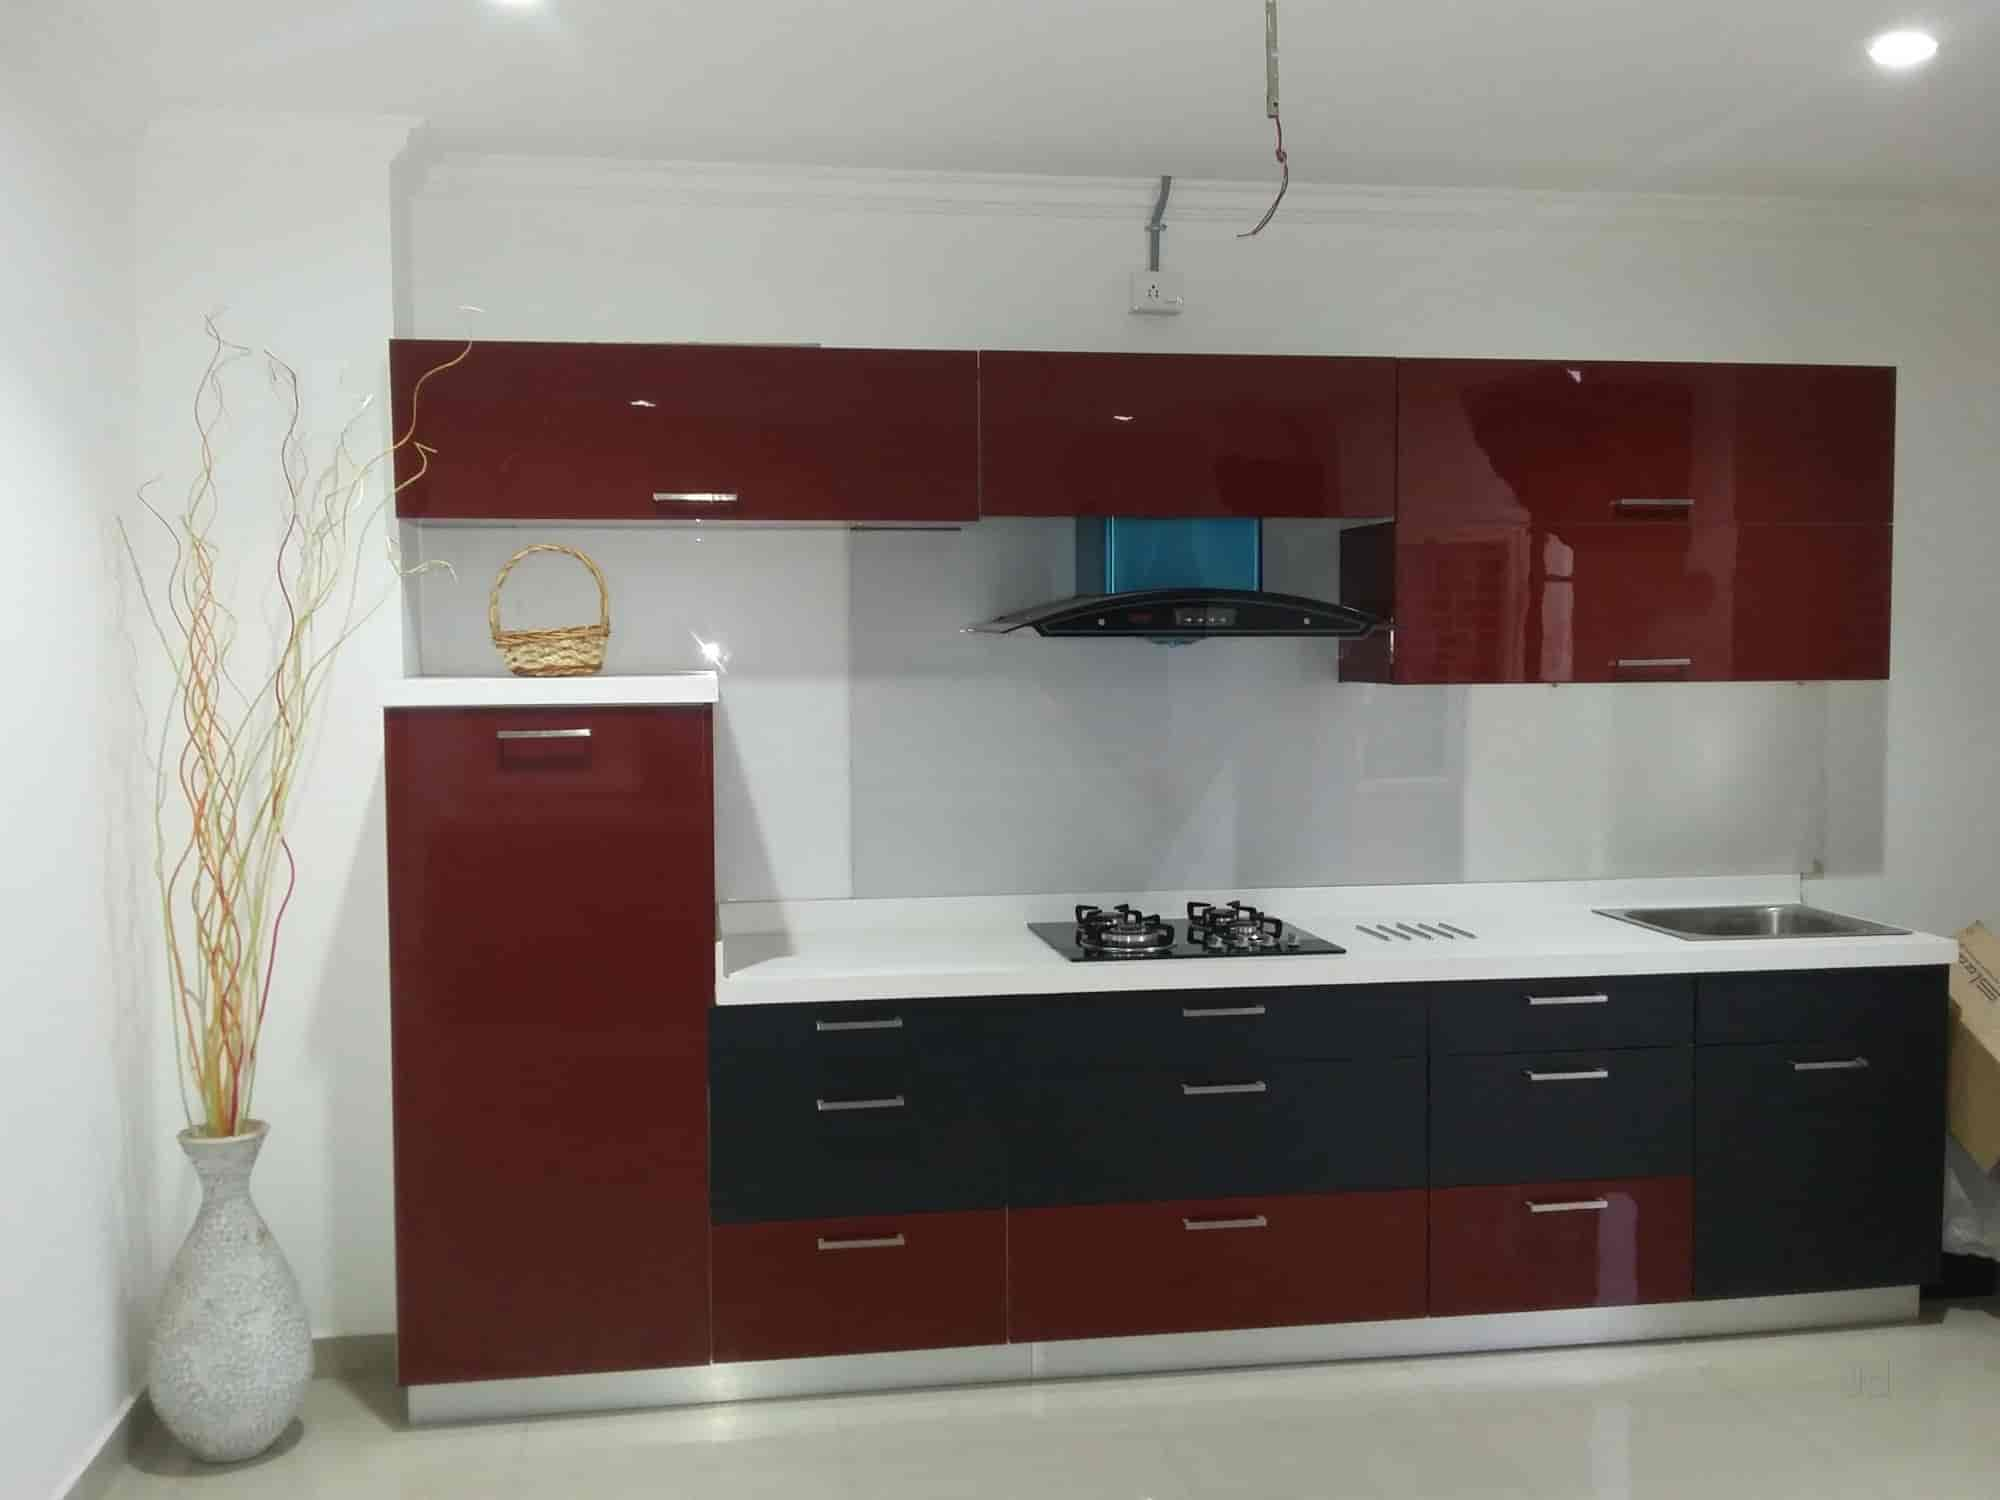 Wonderful Abc Sleek Modular Kitchen And Interiors, Karunagappaly   Interior Designers  In Kollam   Justdial